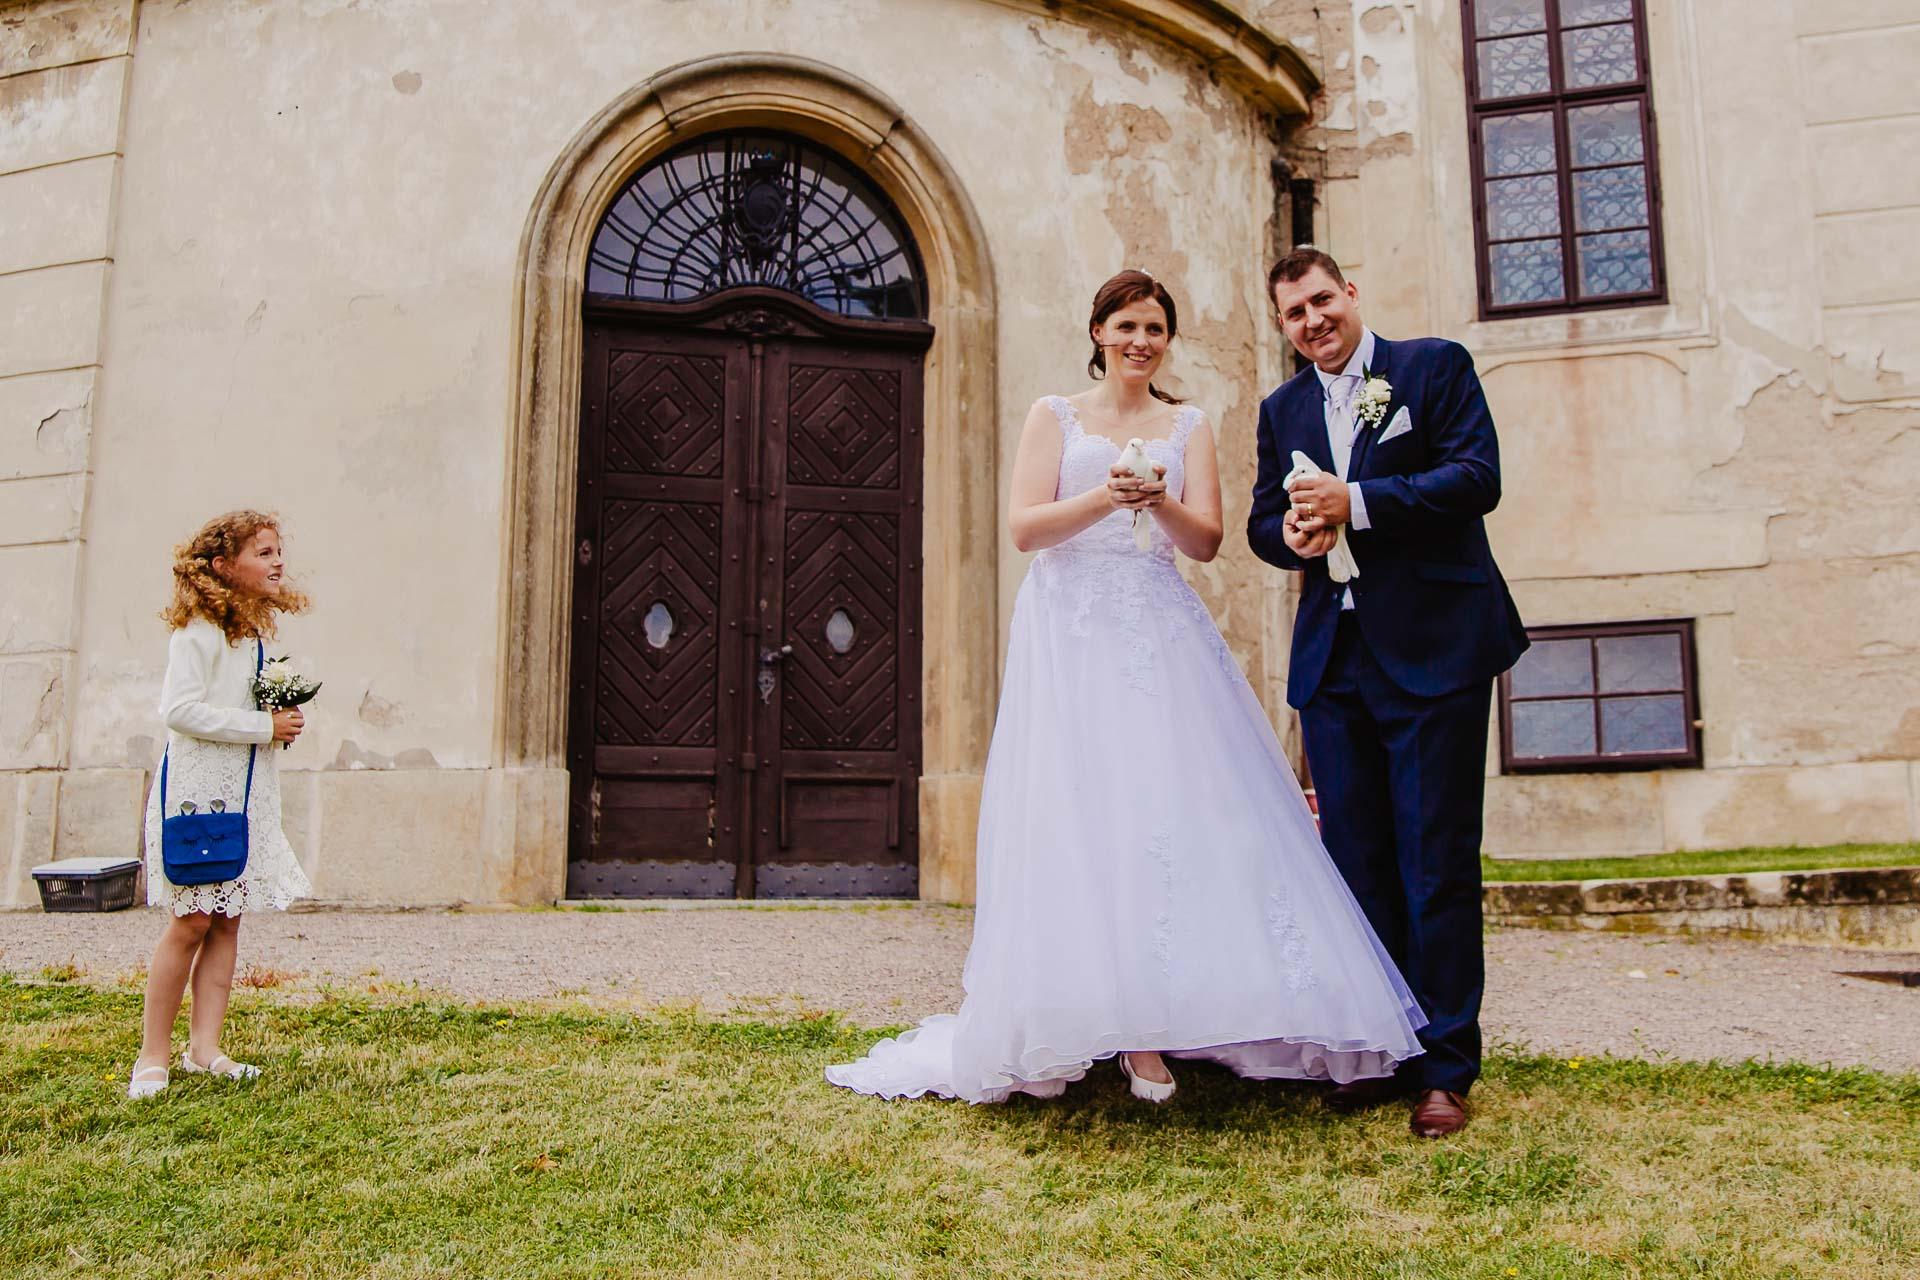 Svatební-fotograf-zámek-Karlova-Koruna-Chlumec-nad-Cidlinou-114